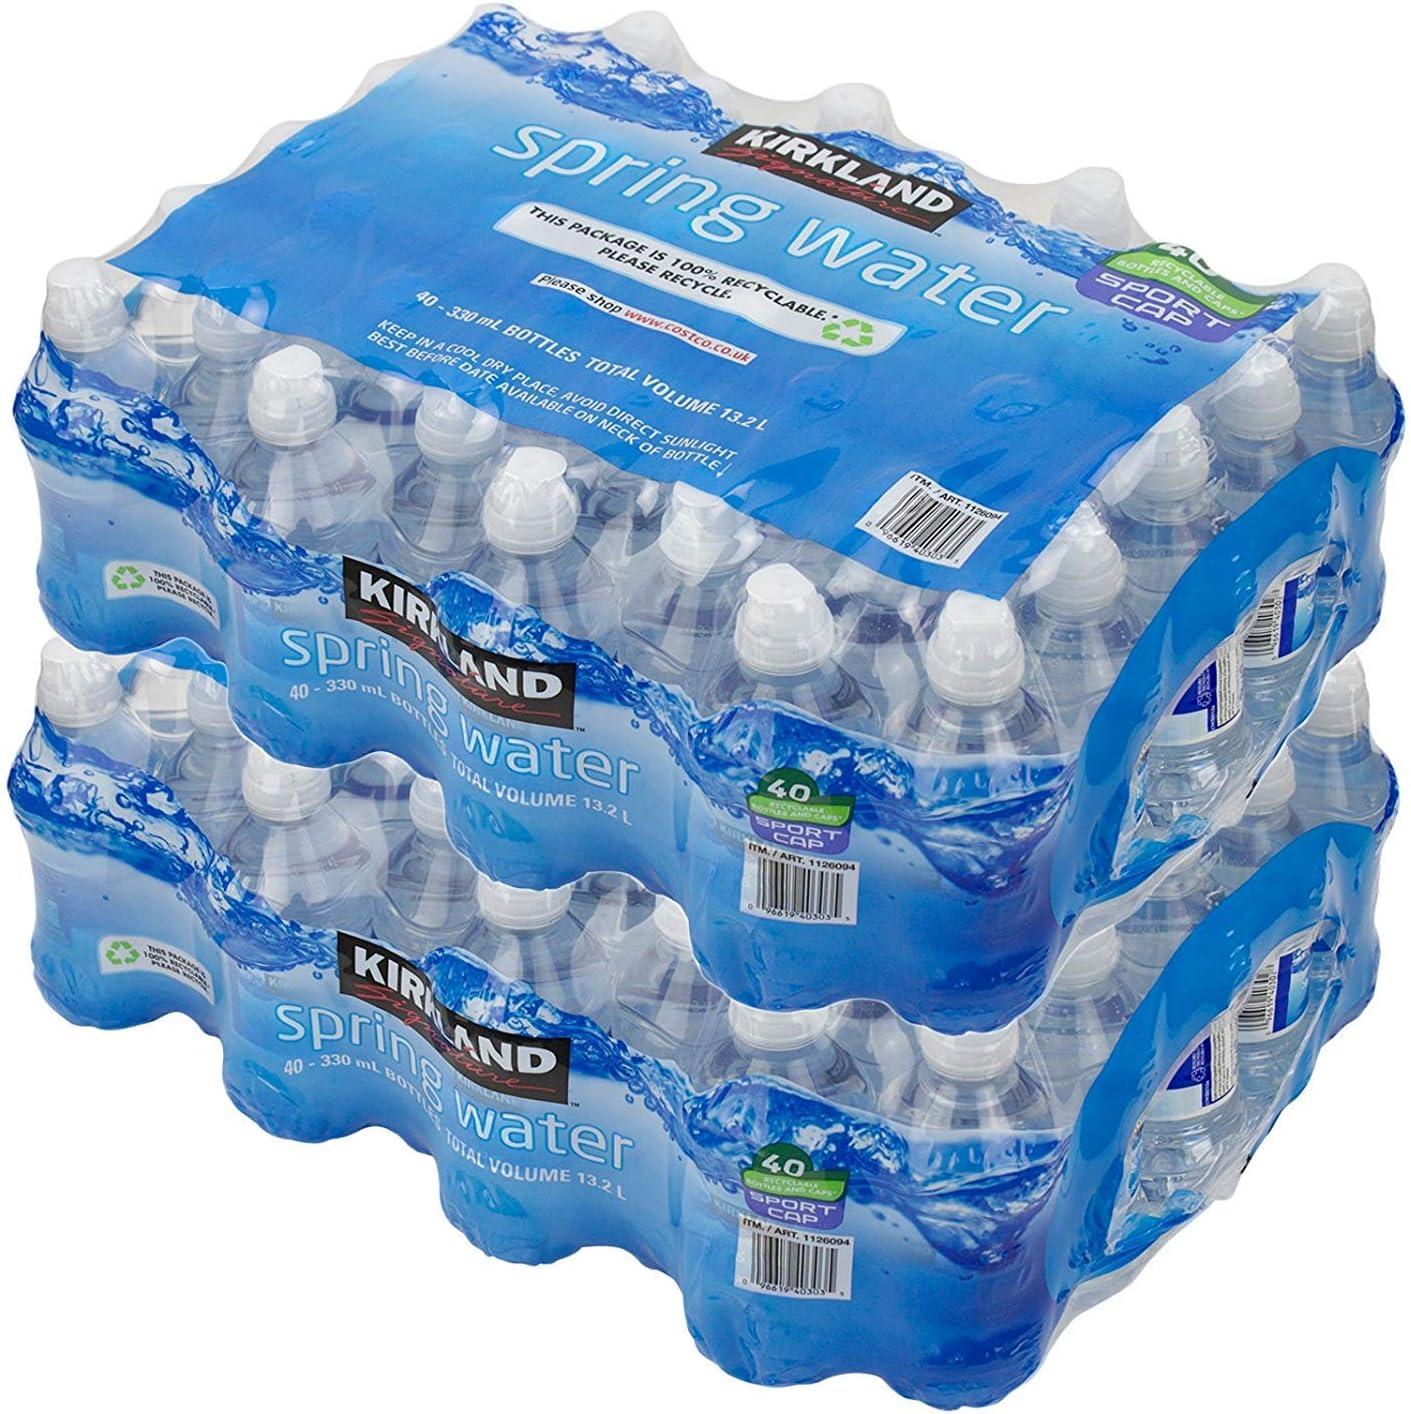 Kirkland Signature Botella de agua natural para deportes acuáticos, 330 ml 40 Count (Pack of 2): Amazon.es: Hogar